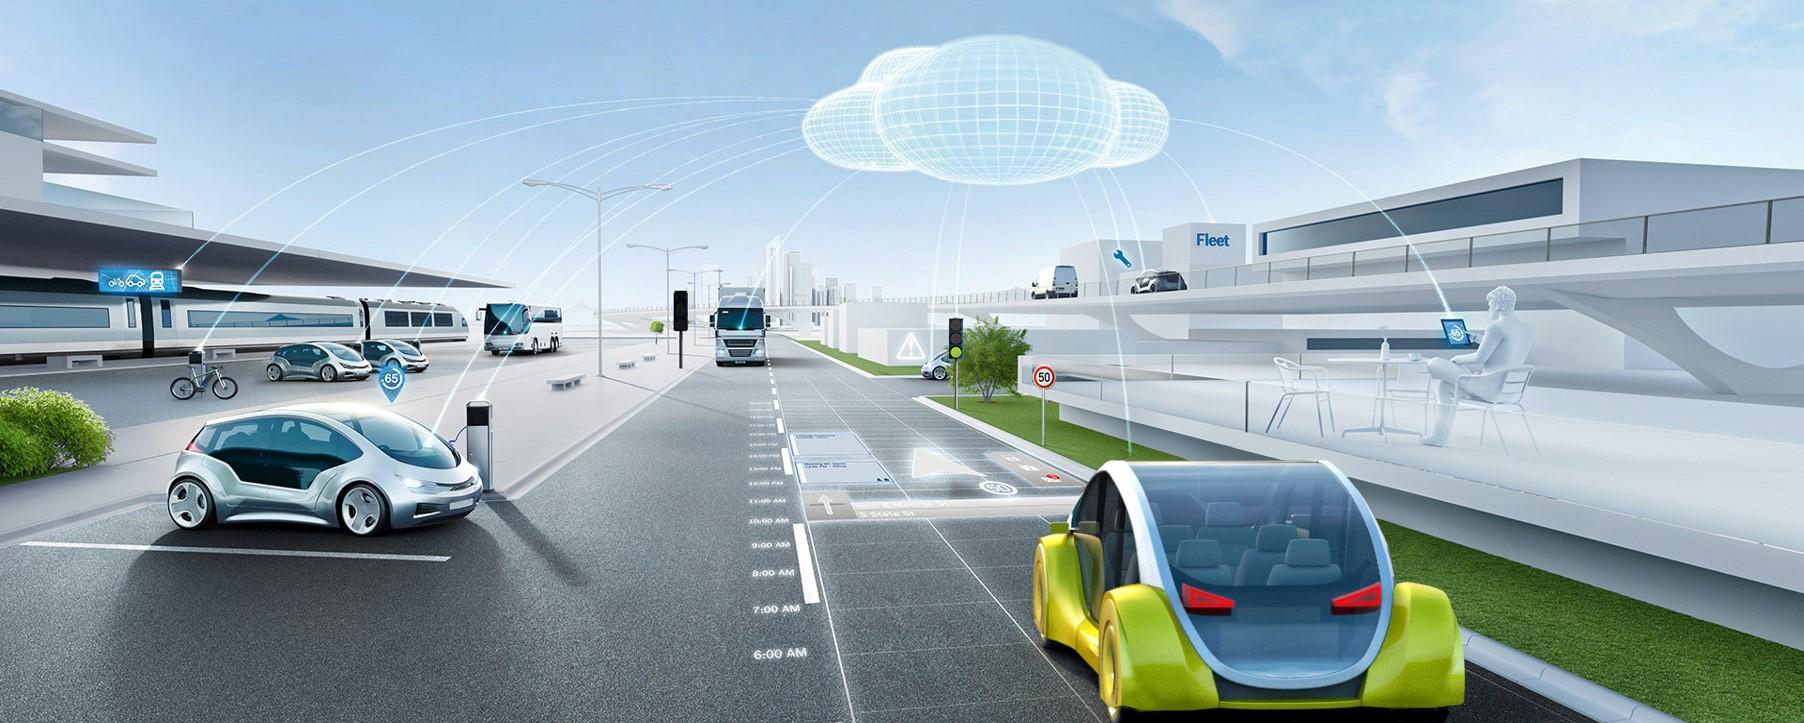 Bosch Launches Automotive Cloud Suite for Connected Cars